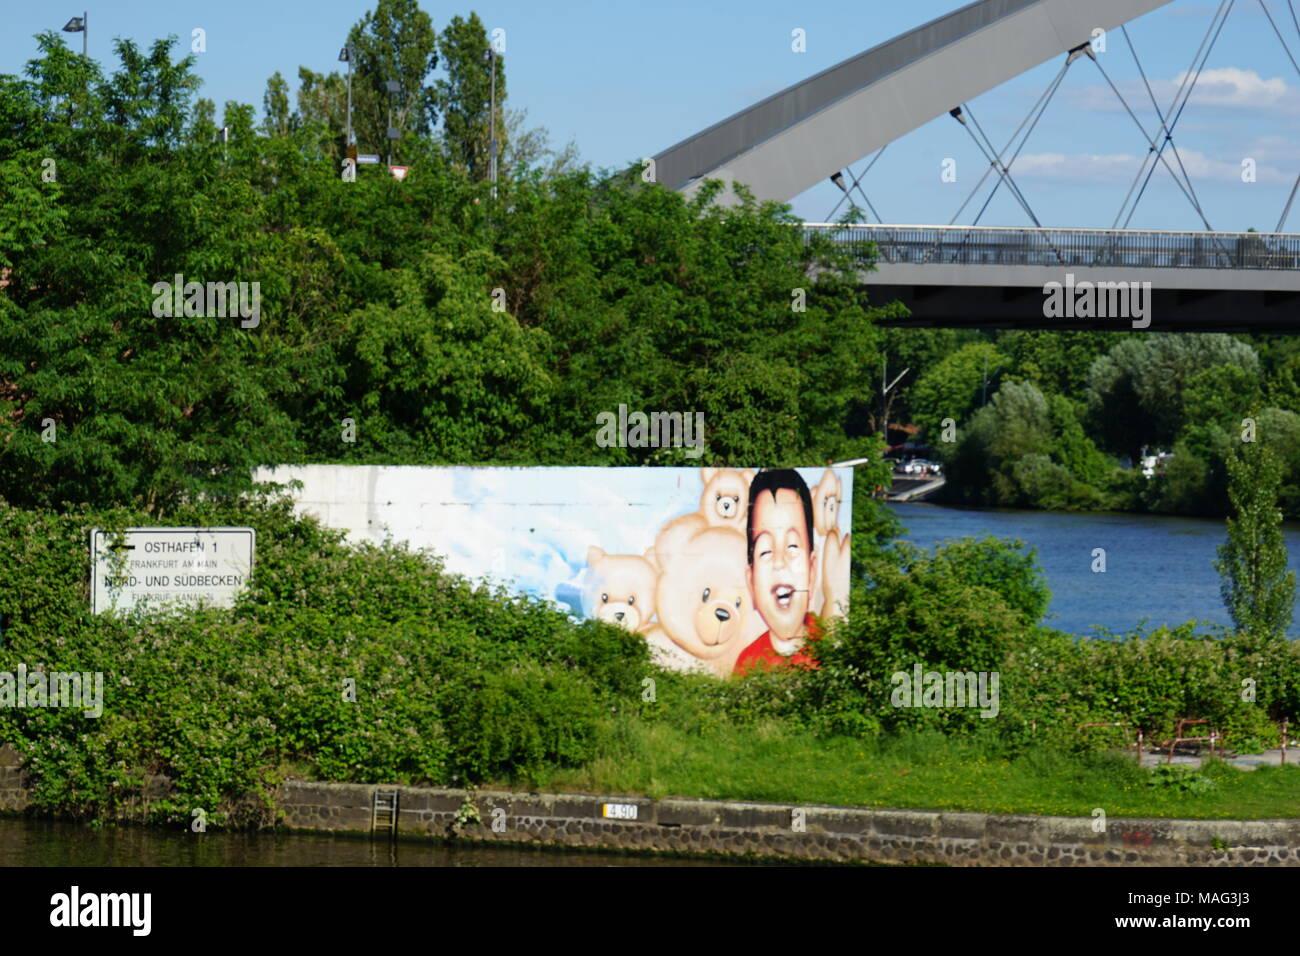 Mural, Osthafen, Osthafenbrücke, Frankfurt, Germany, Stock Photo